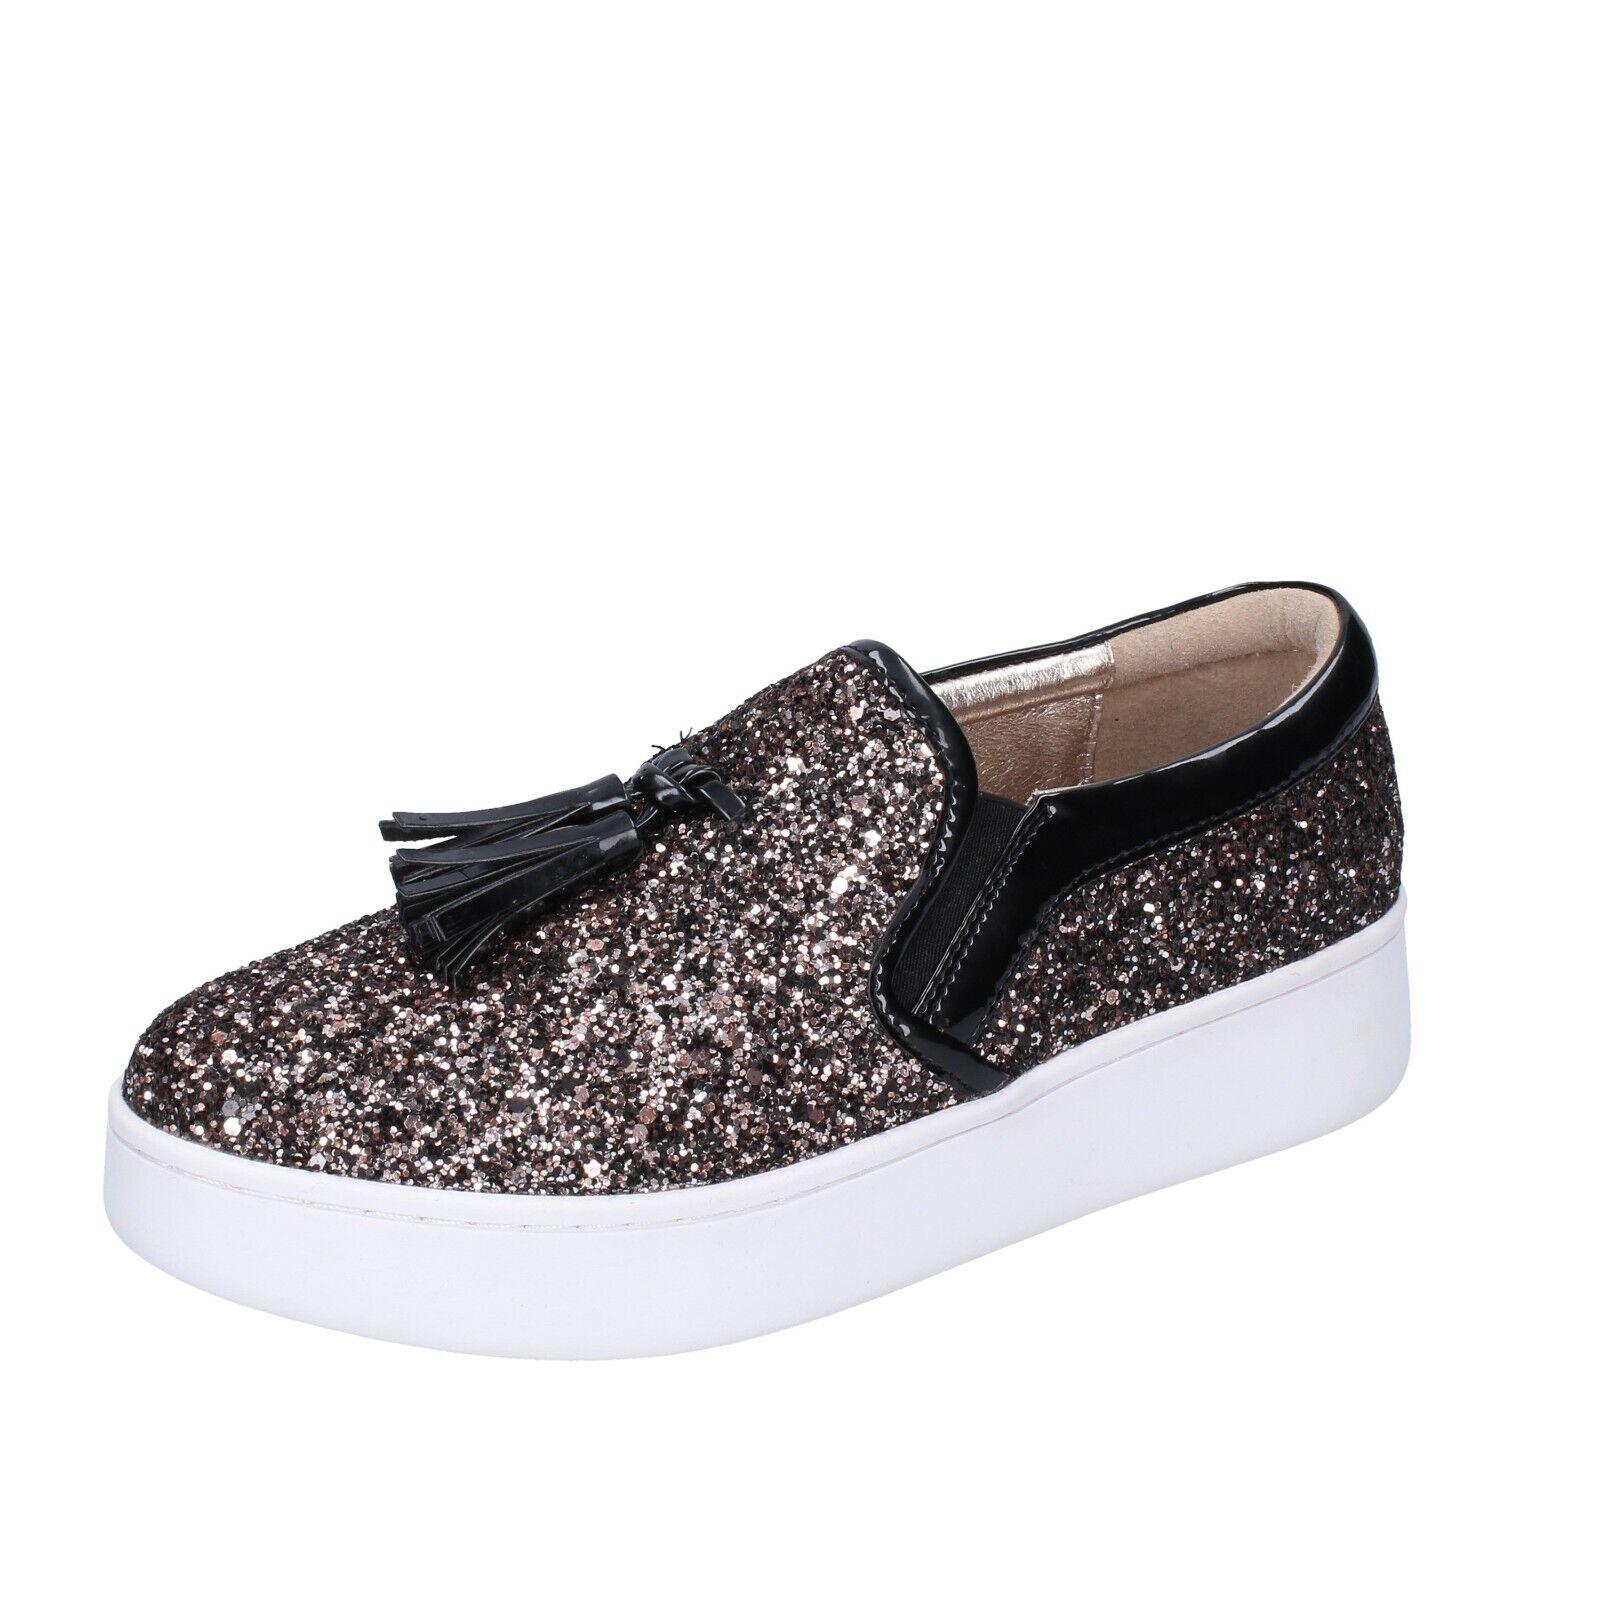 Women's shoes UMA PARKER 9 (EU 39) slip on brown glitter BR55-39